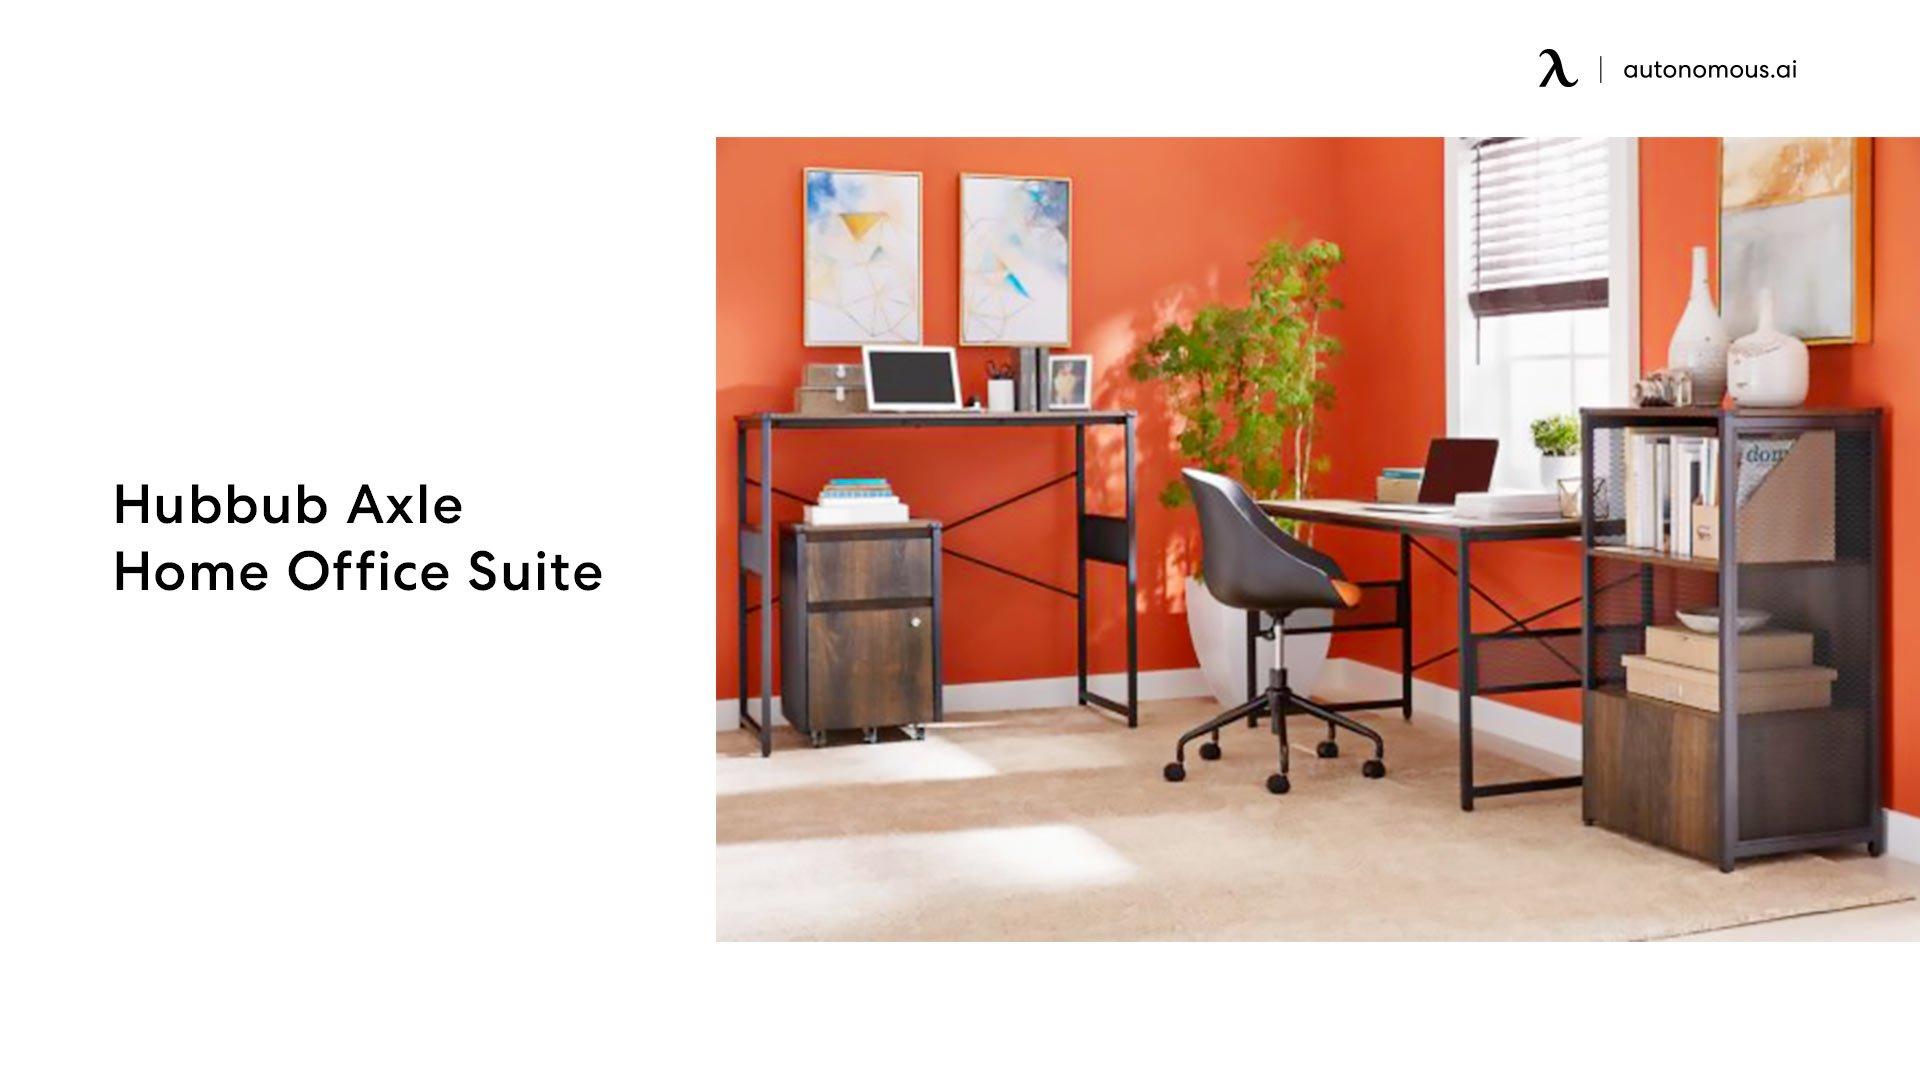 Hubbub Axle Home Office Suite office desk set